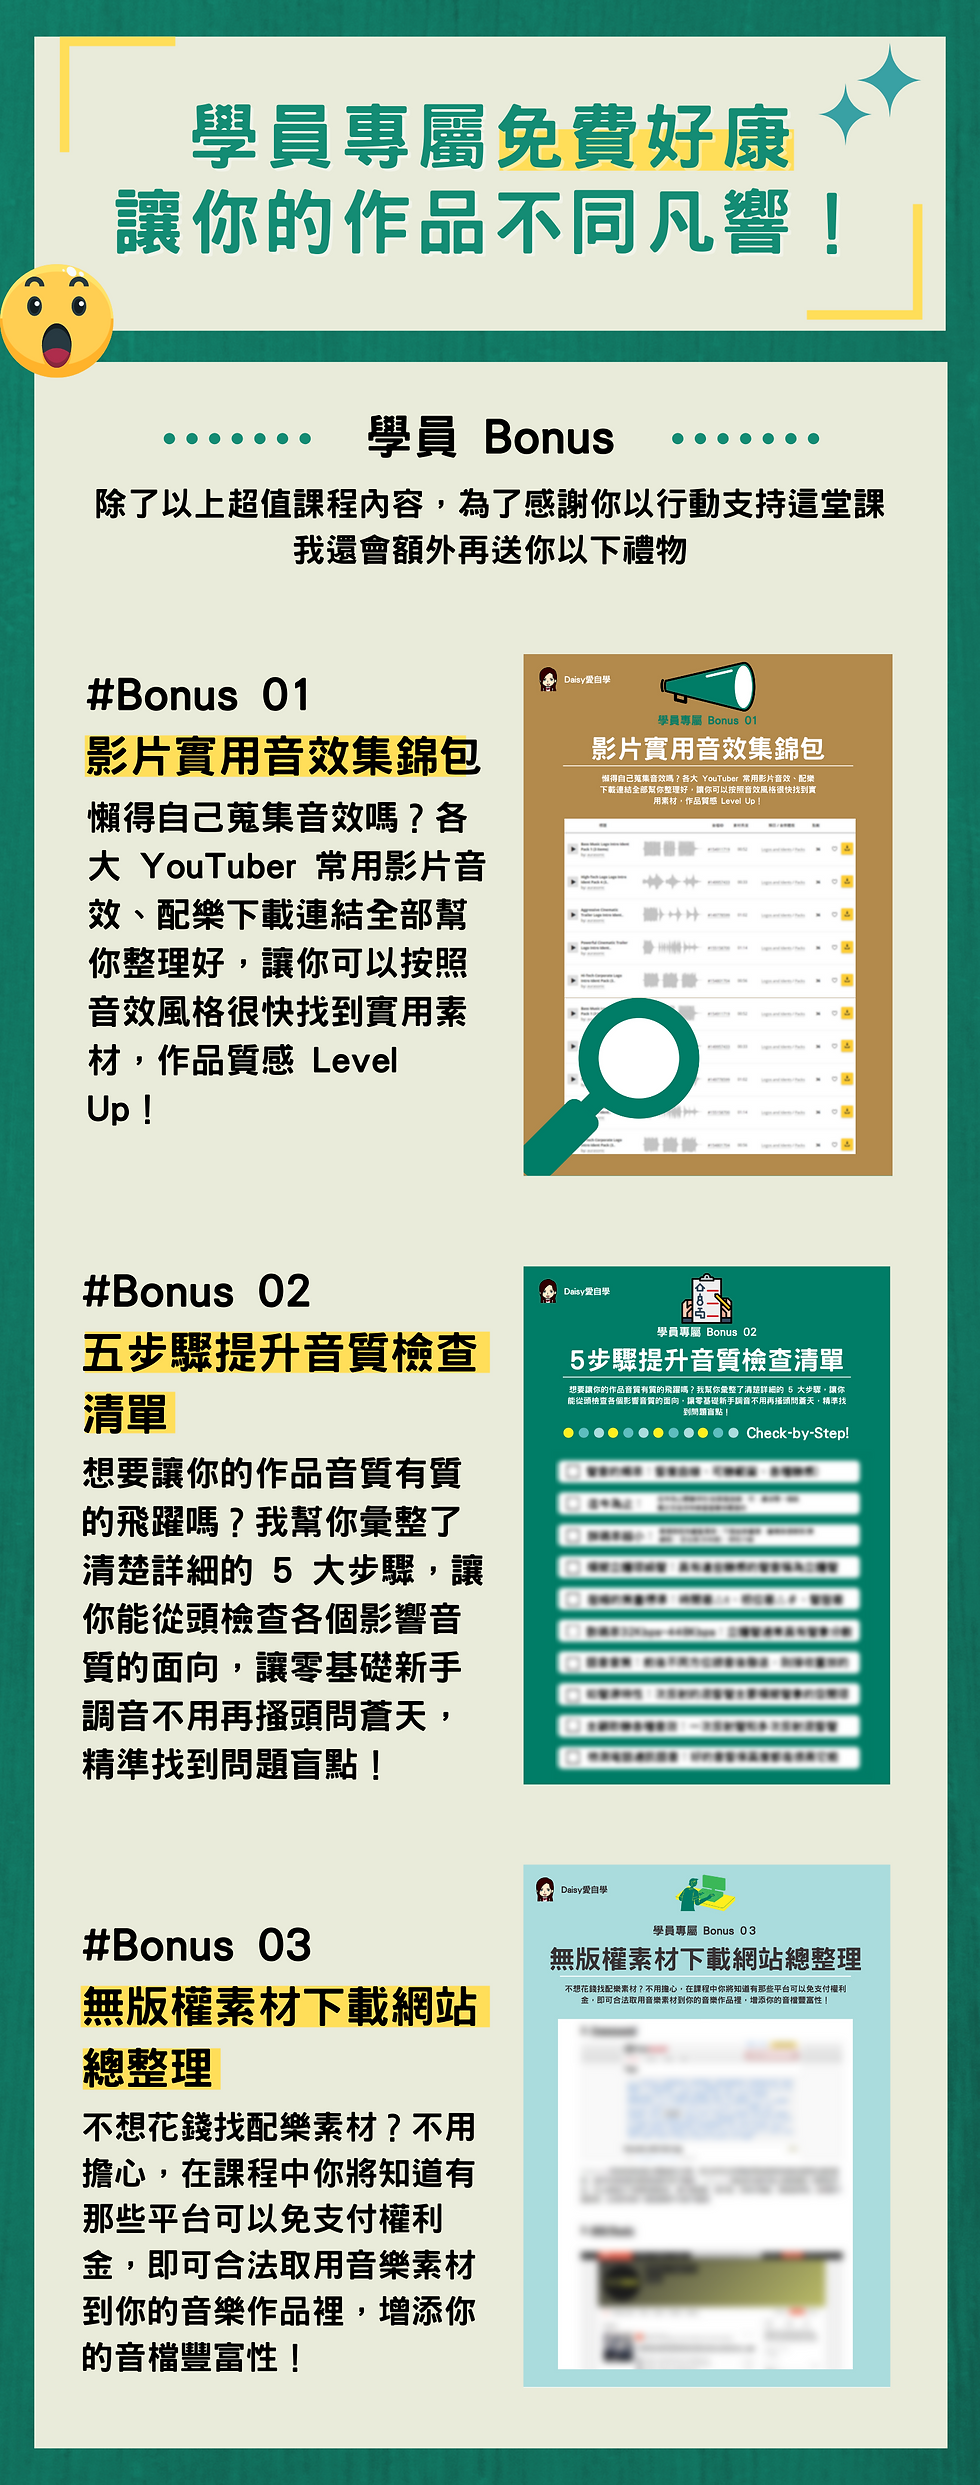 (N) 手機板- (11) Bonus - AU 新手攻略課程 (1).png